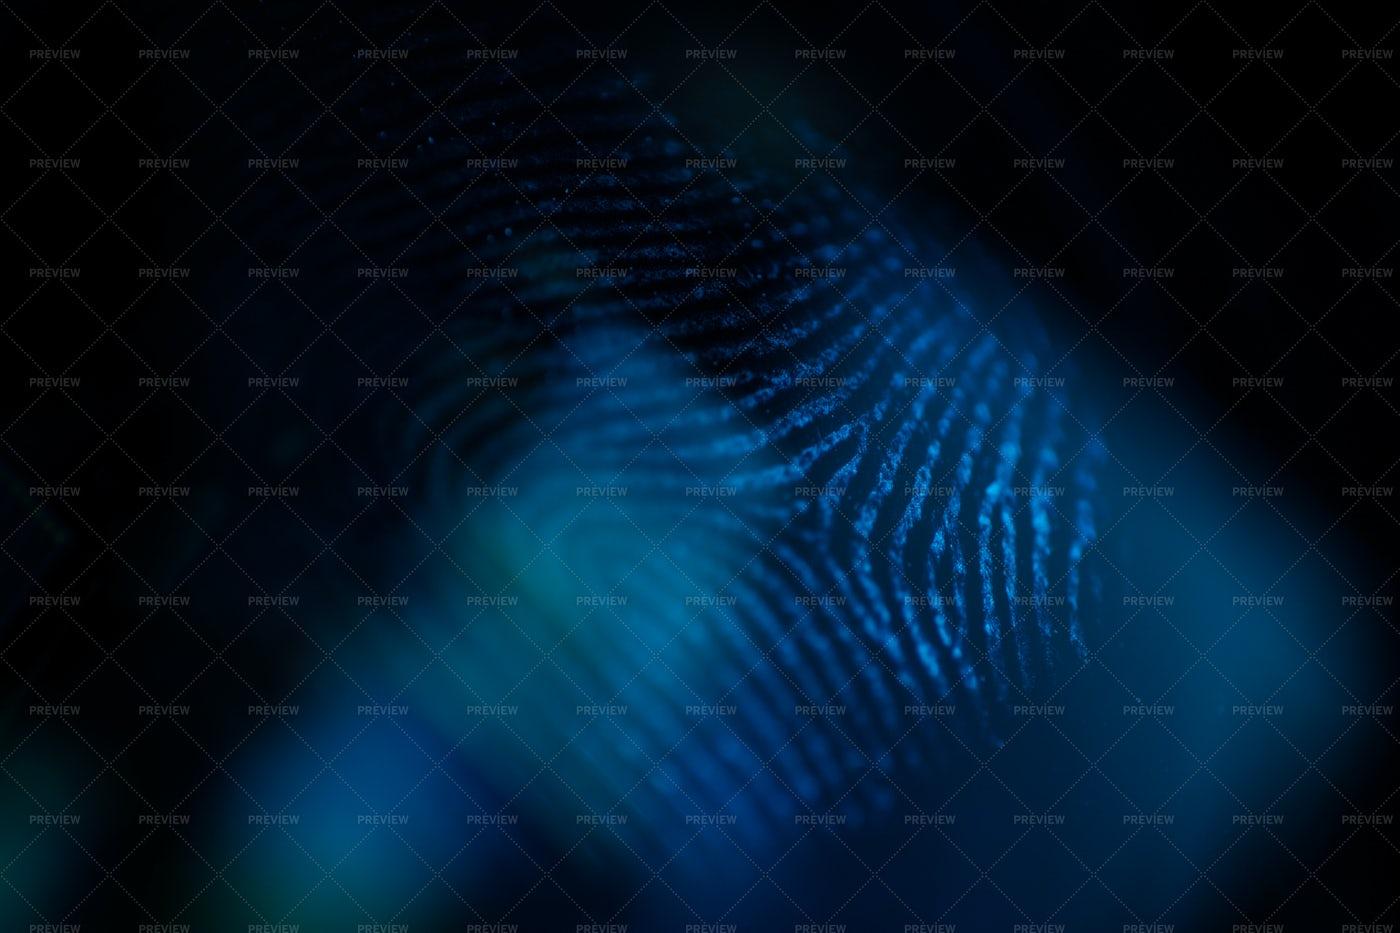 Fingerprint In The Dark: Stock Photos